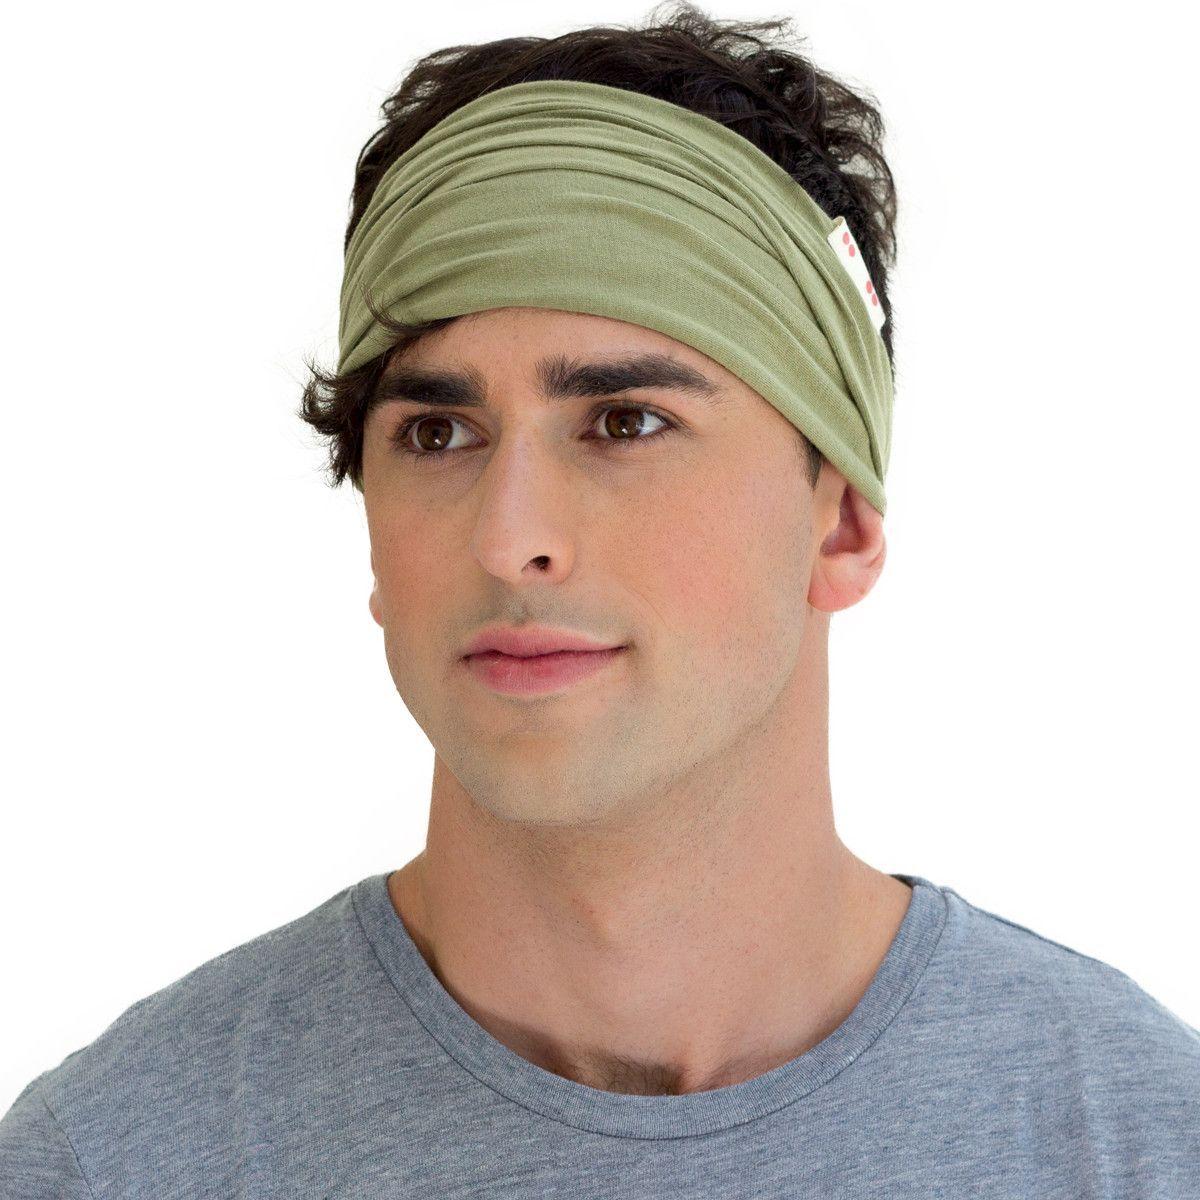 Men's haircut los angeles twist headband safari green  products